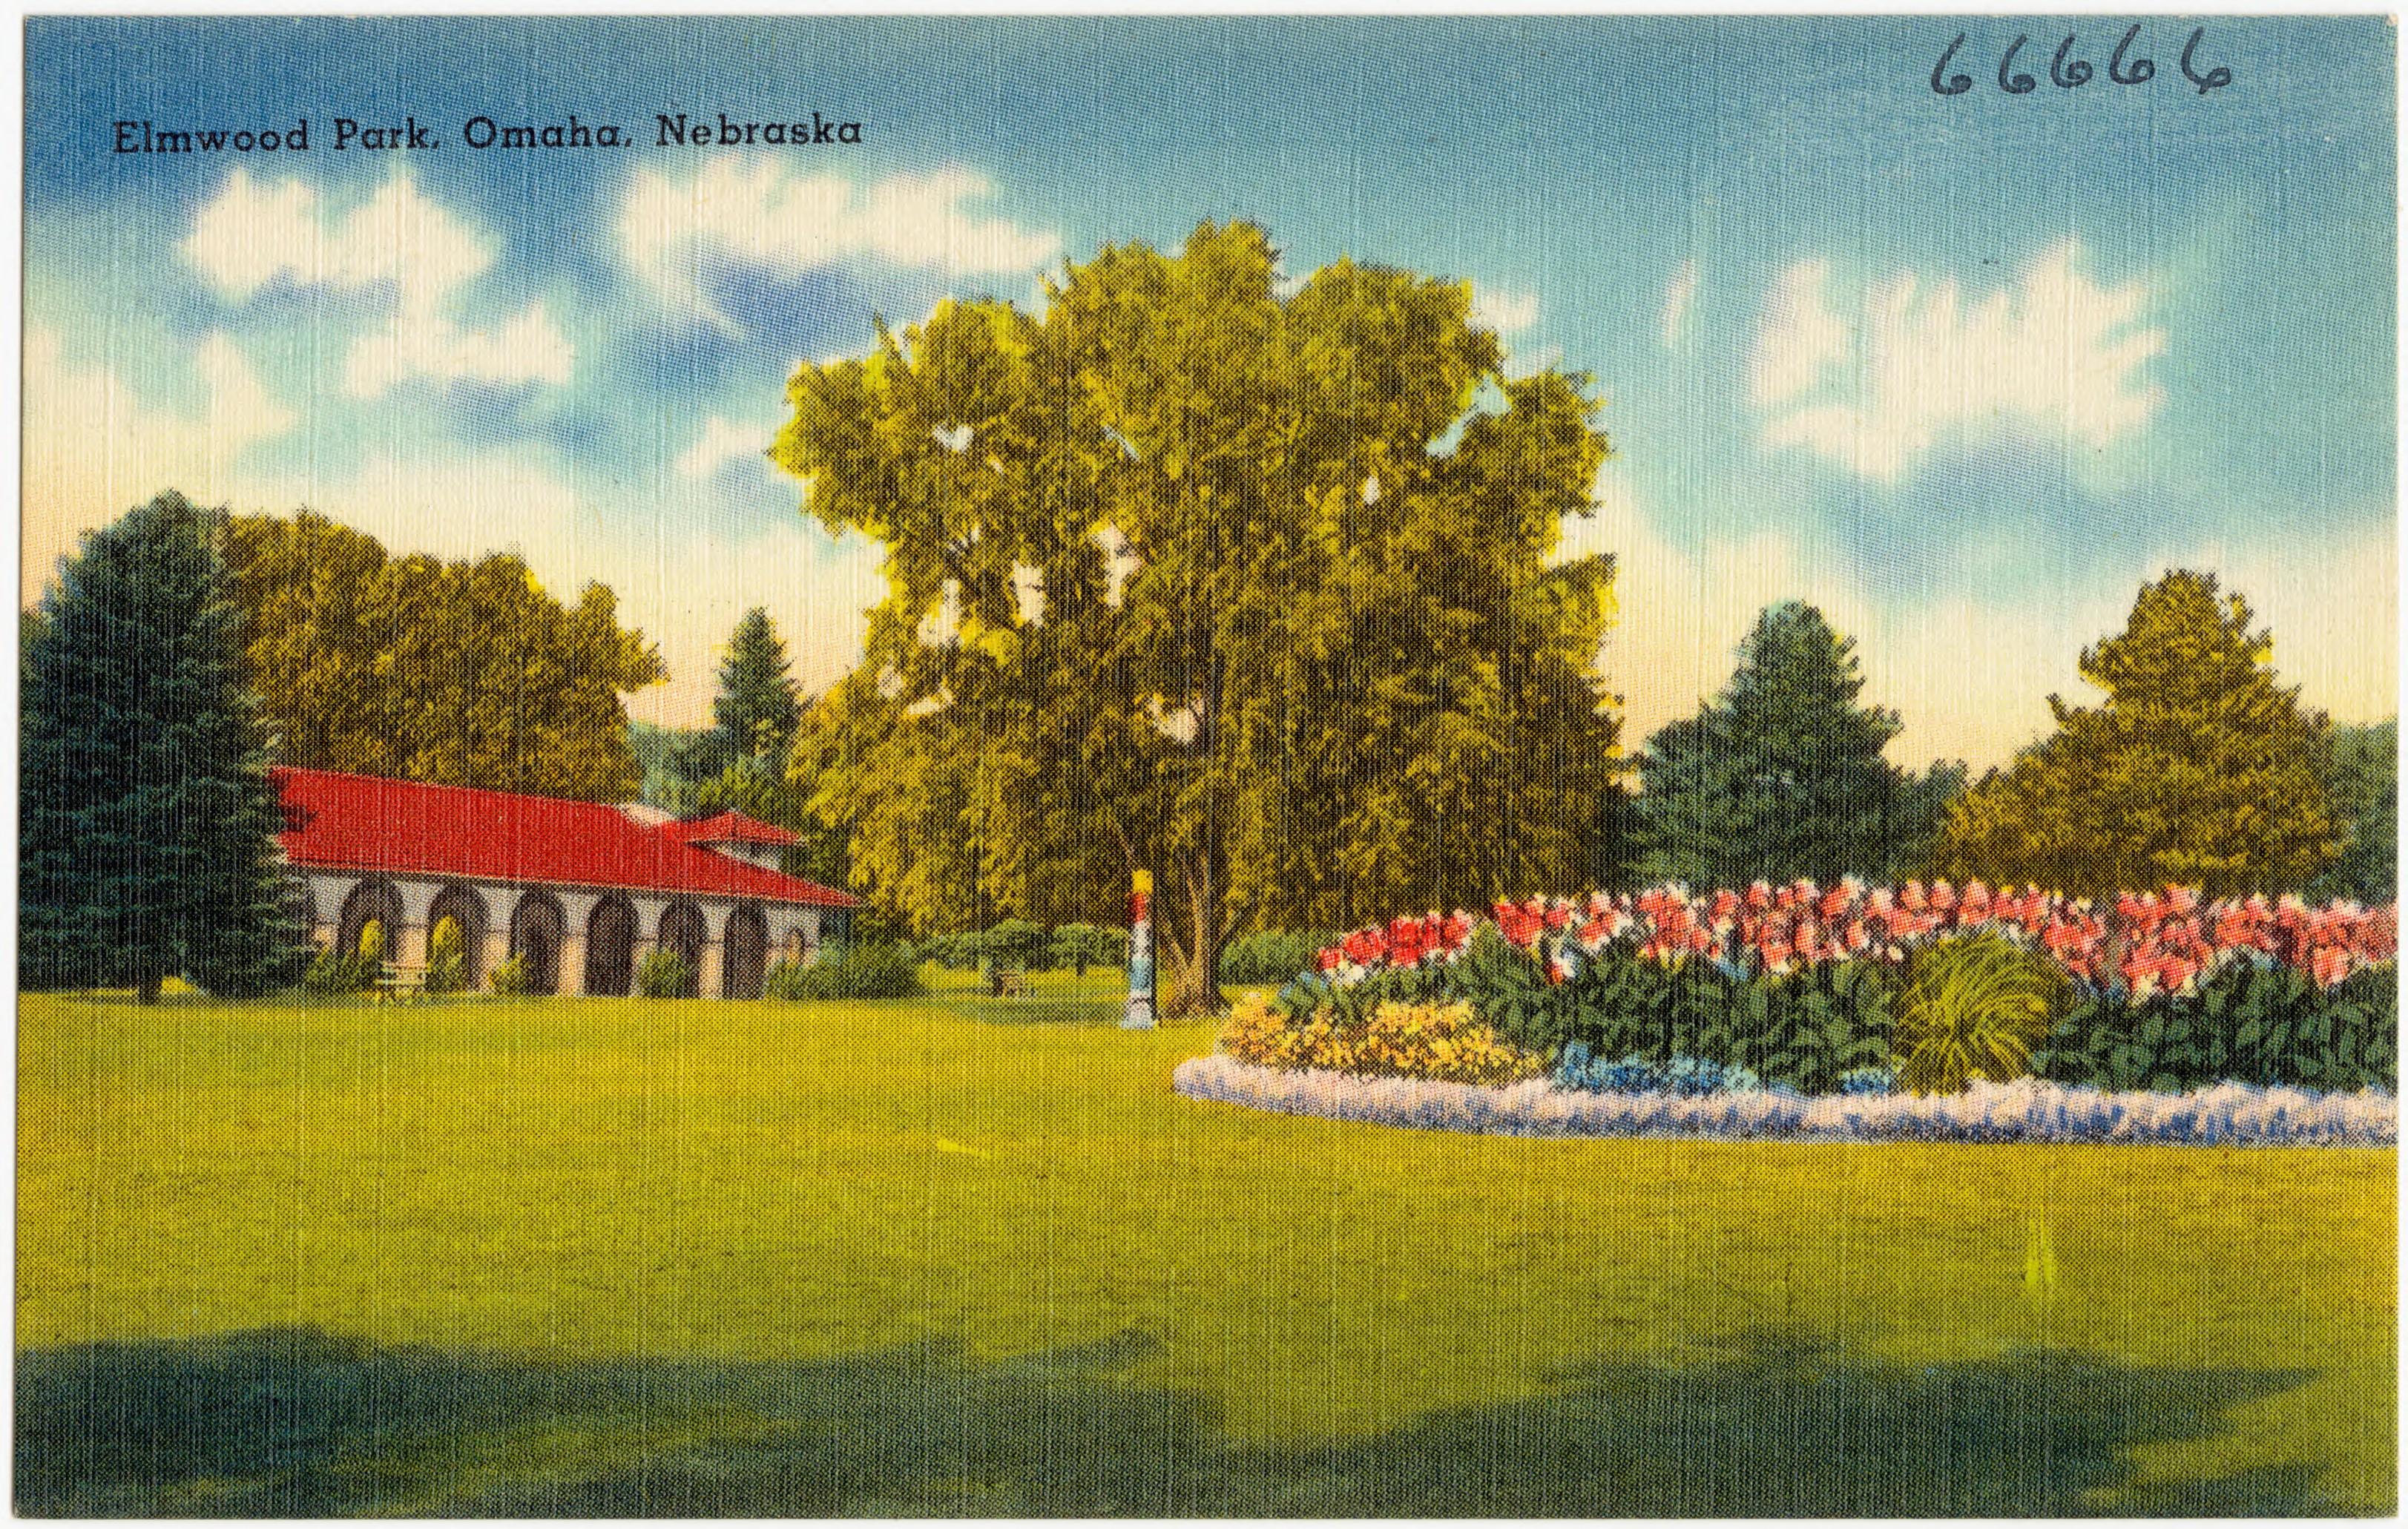 File:Elmwood Park, Omaha, Nebraska (66666).jpg - Wikimedia Commons